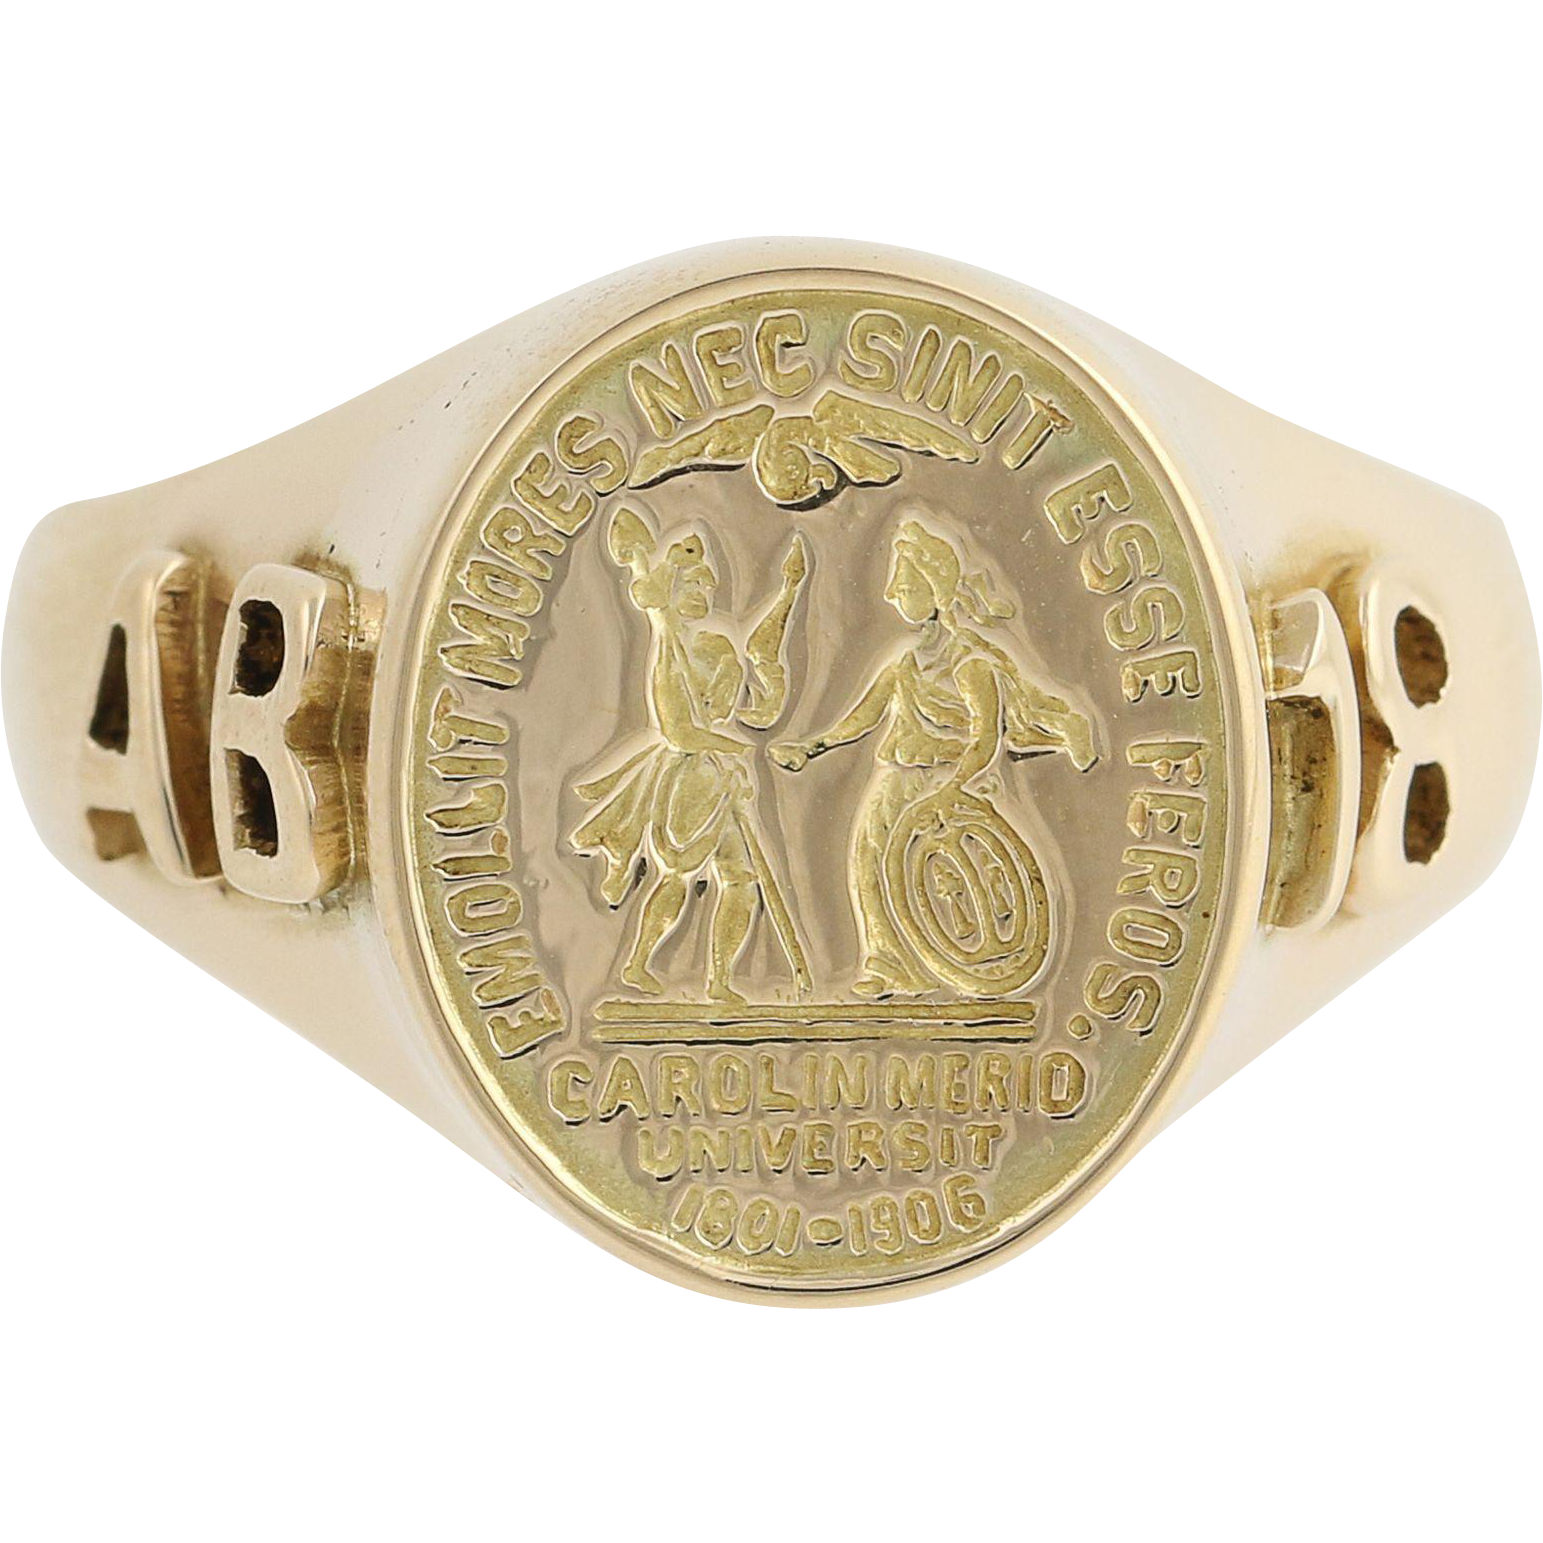 Vintage University of South Carolina Class Ring - 14k Yellow Gold Circa 1918